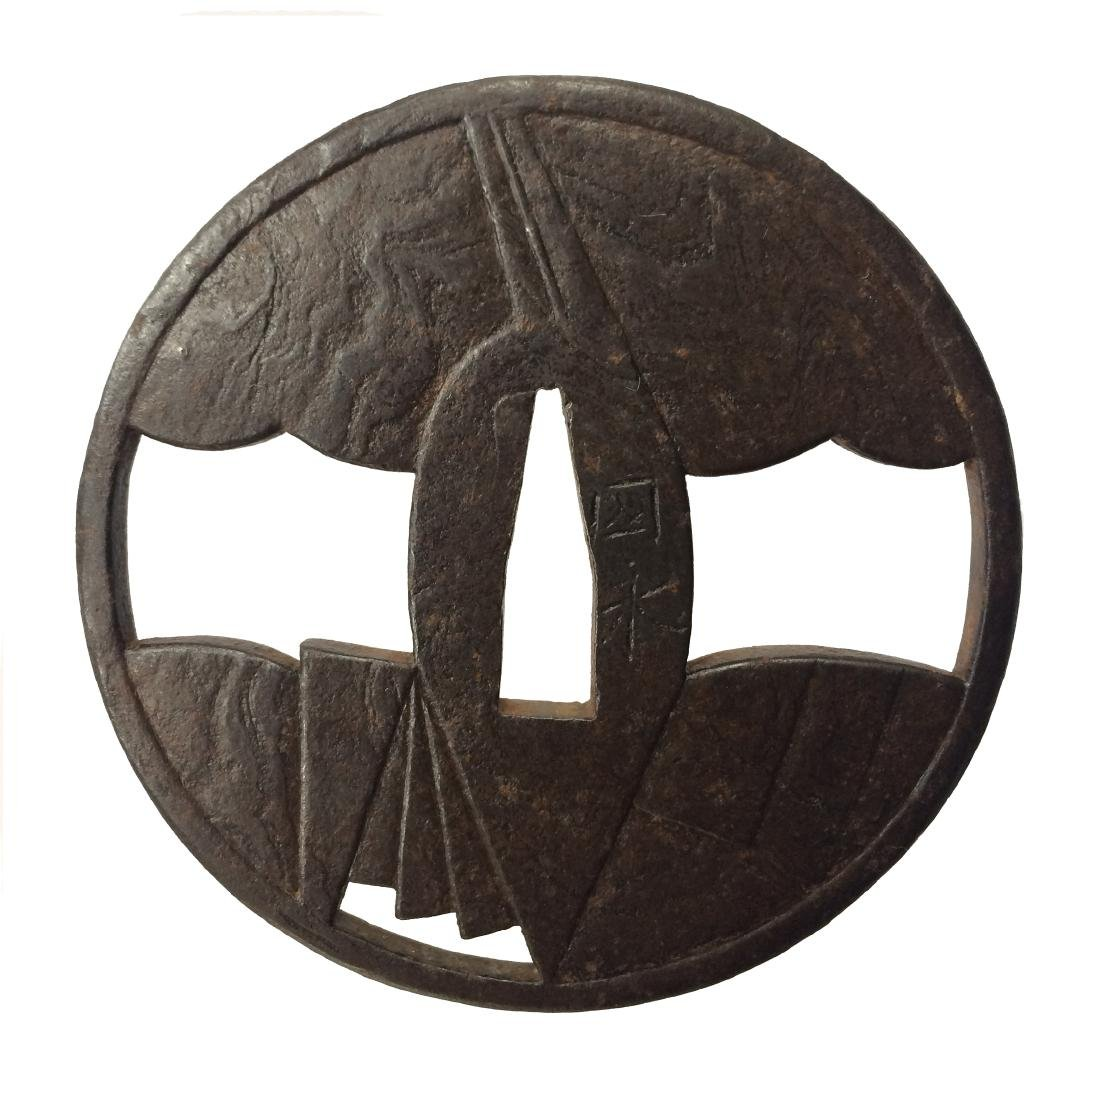 Iron tsuba with wood grain surface (mokume)byKuninaga